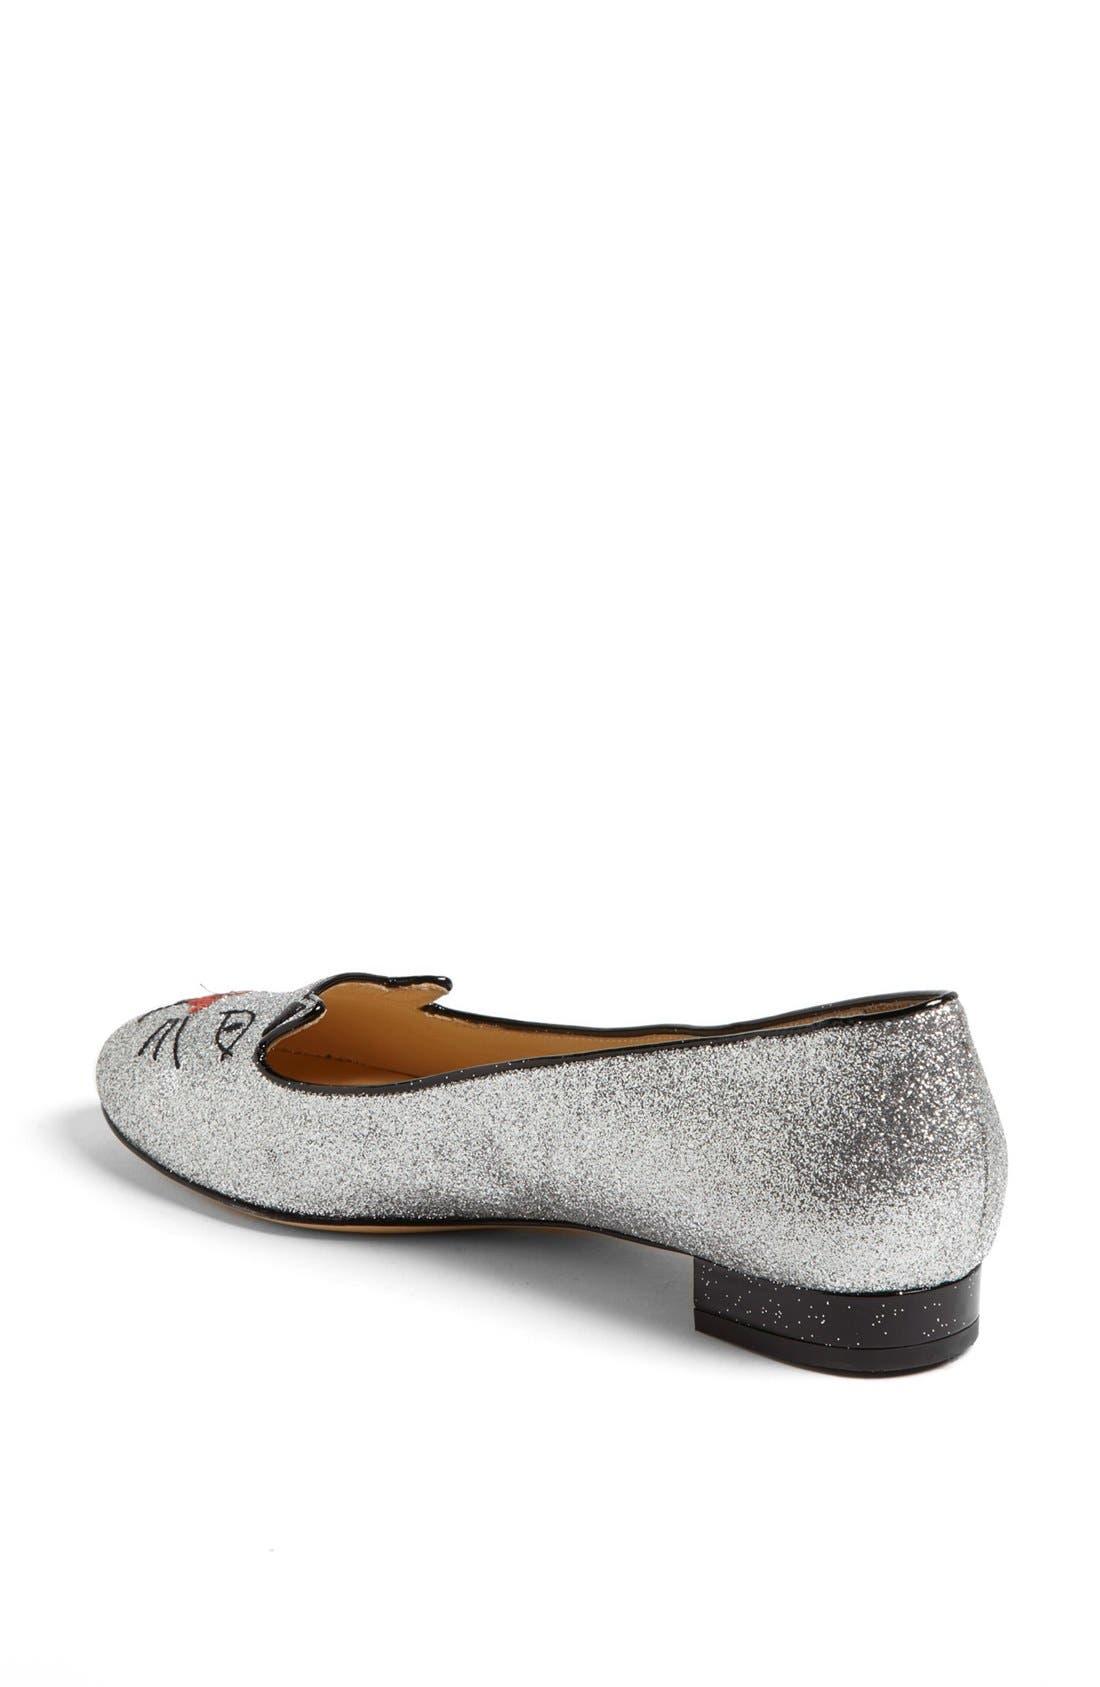 Alternate Image 3  - Charlotte Olympia 'Glitter Kitty' Flat